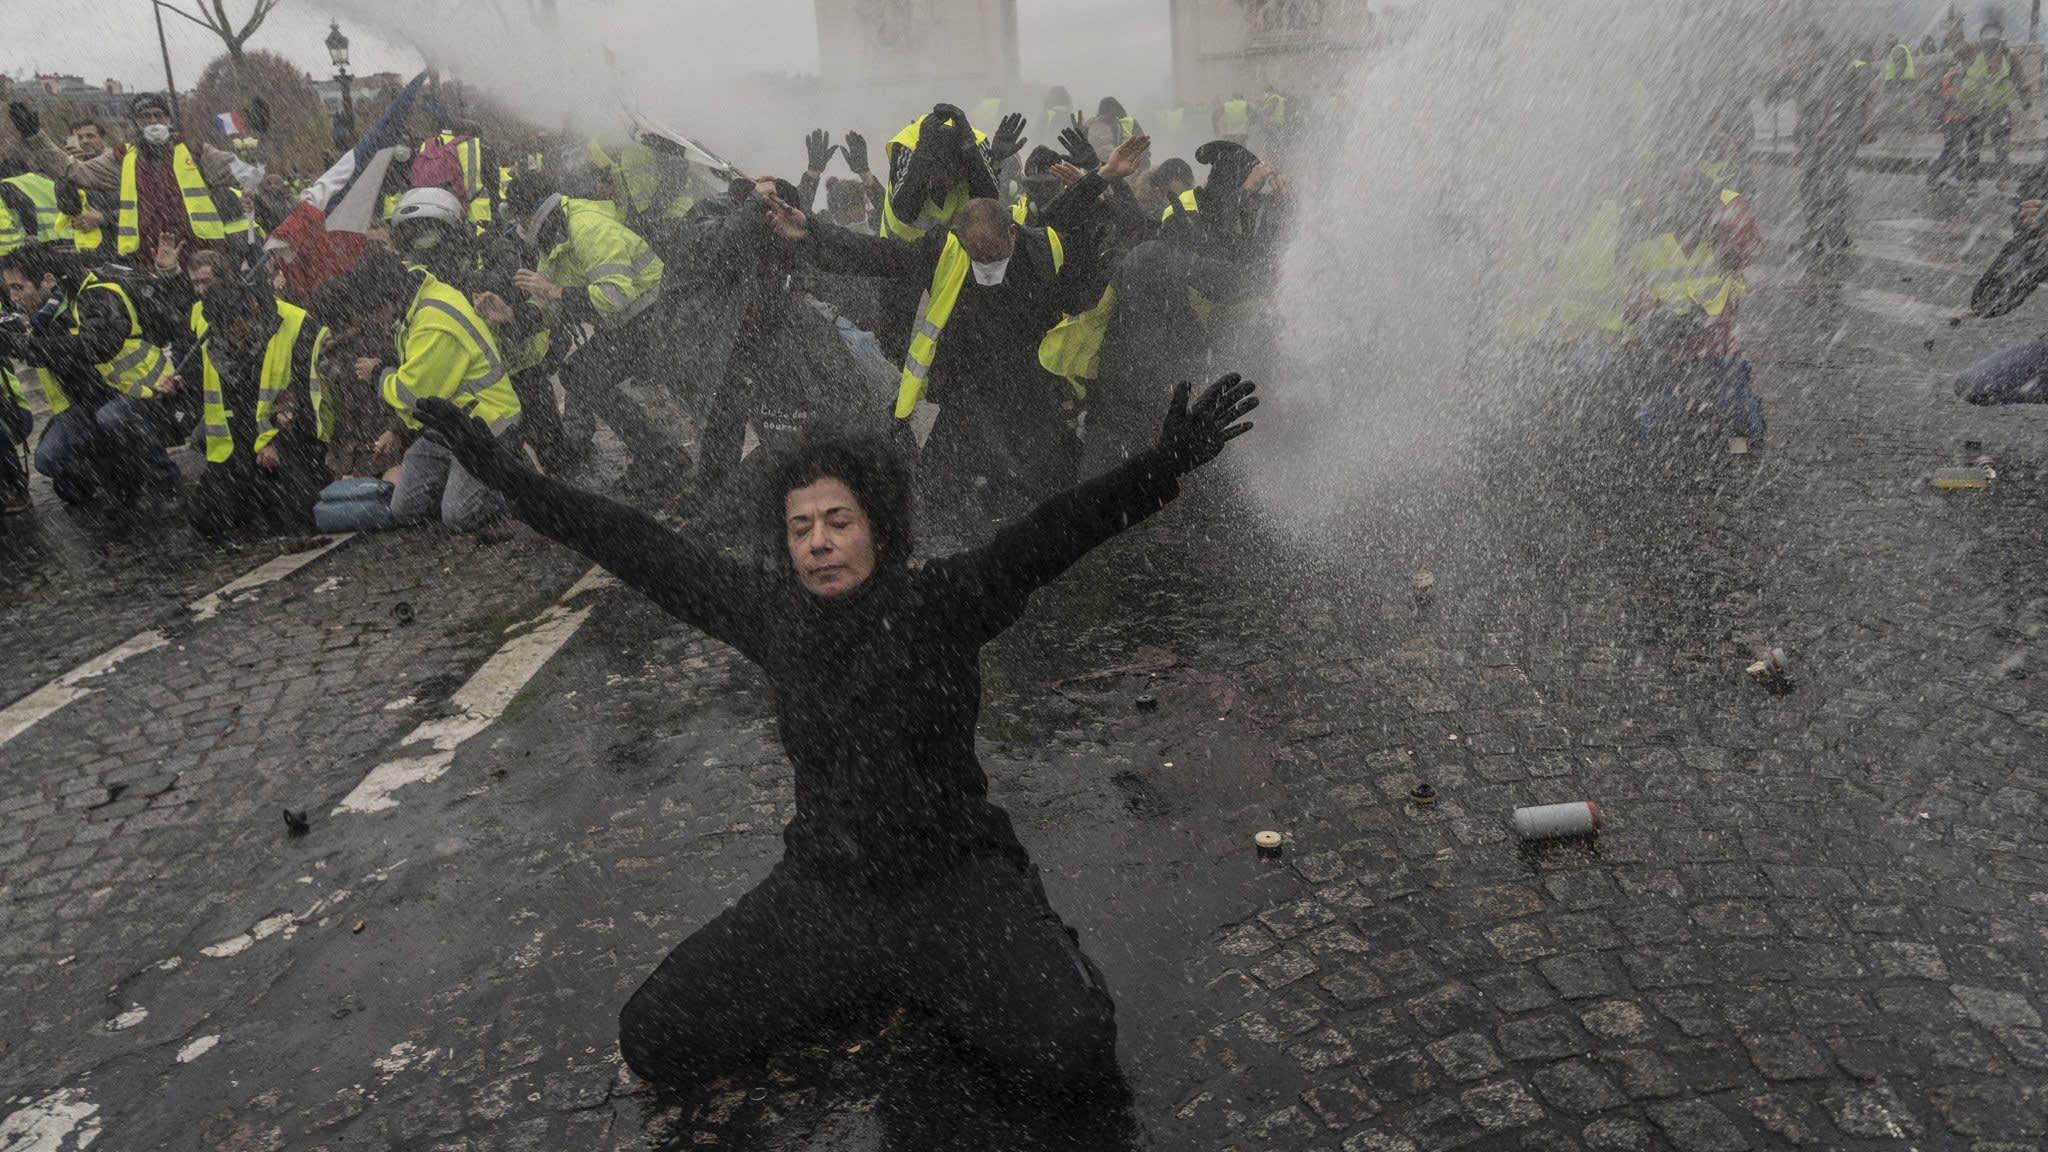 Emmanuel Macron fails to buck trend of French presidential U-turns